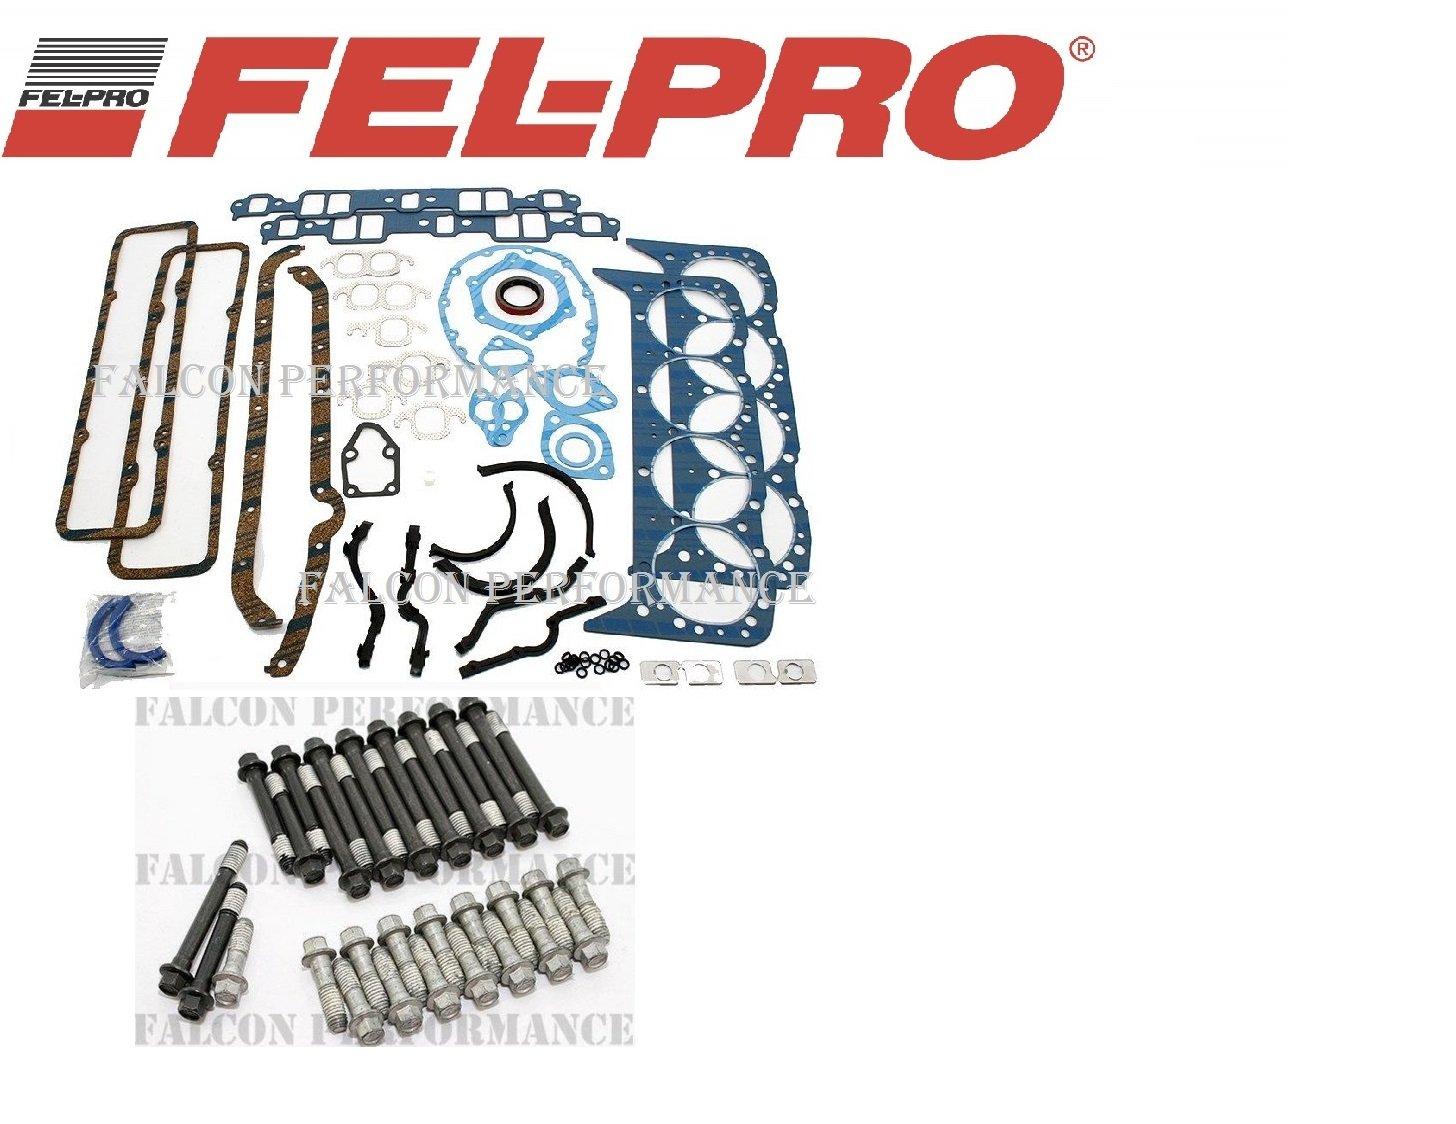 FEL-PRO Full Gasket Set+BOLTS for MERCRUISER CHEVY MARINE 327 350 5.7 w/2pc seal (Gskts & Bolts)